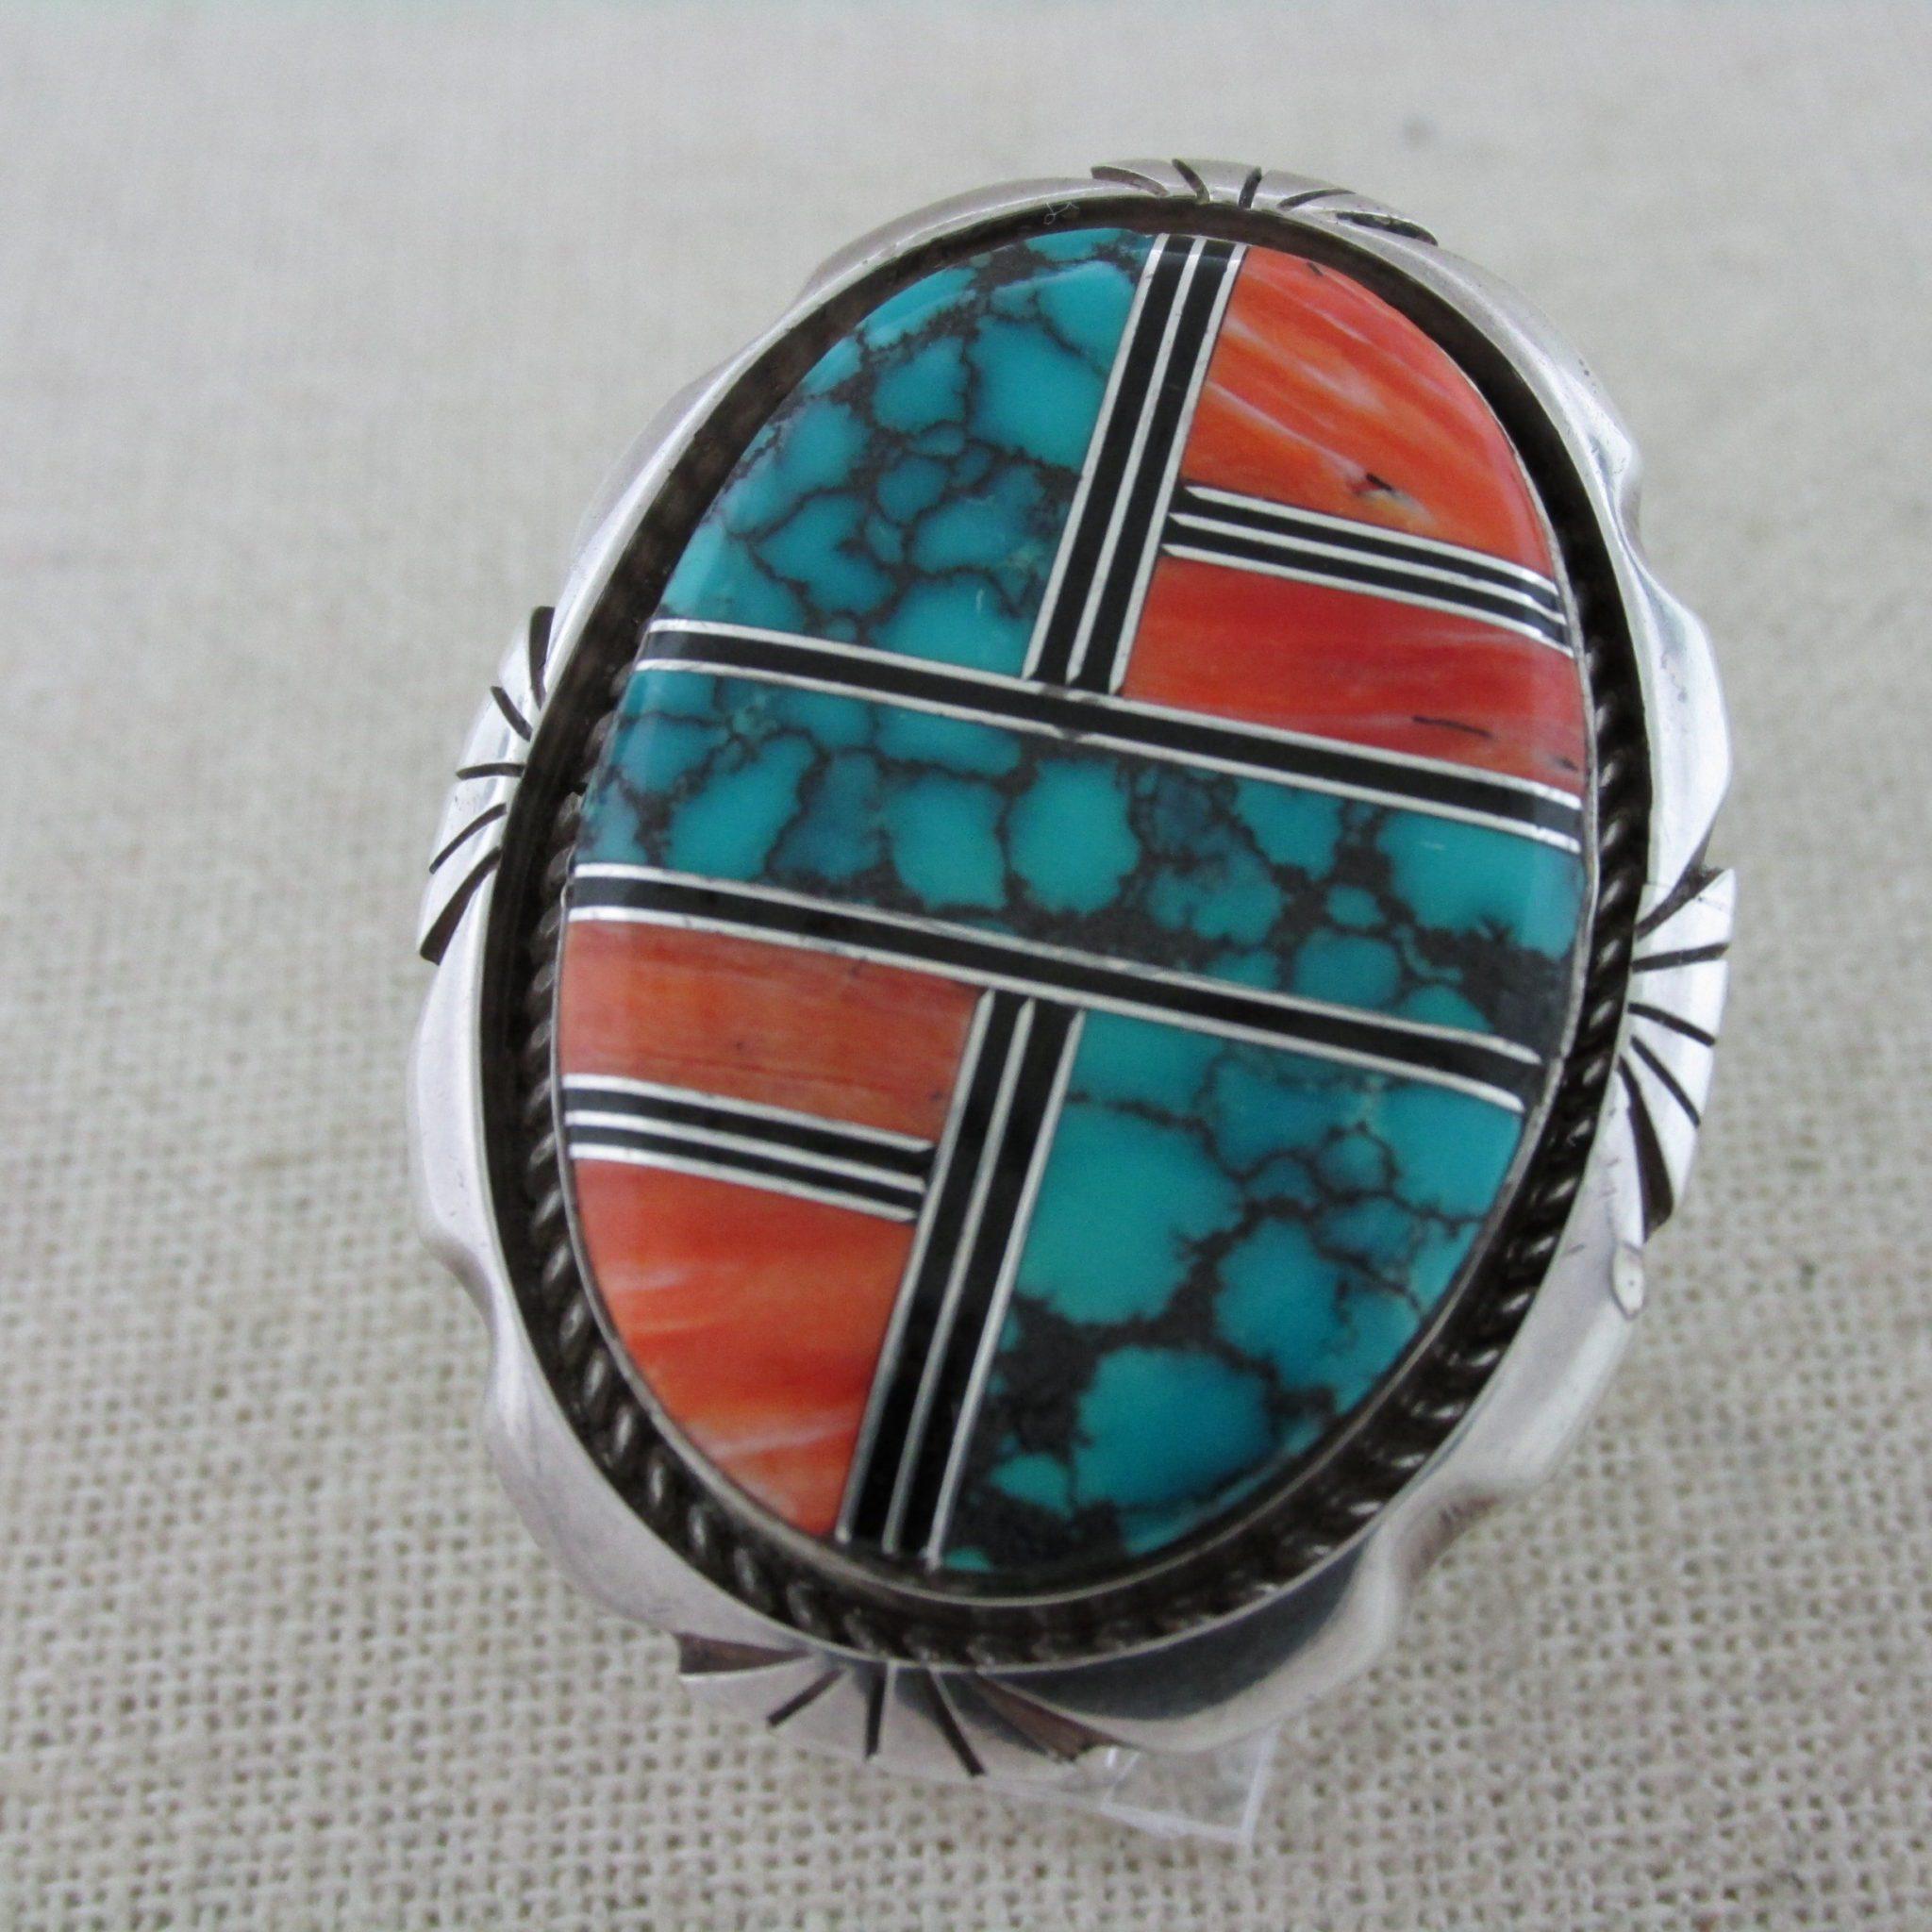 STERLING SPIDER Ring Size 9-14 to 9-12 Vintage 925 Silver-Navajo Indian Cortez H Hallmark-Arachnid Tarantula Widow Good Luck Lucky Amulet